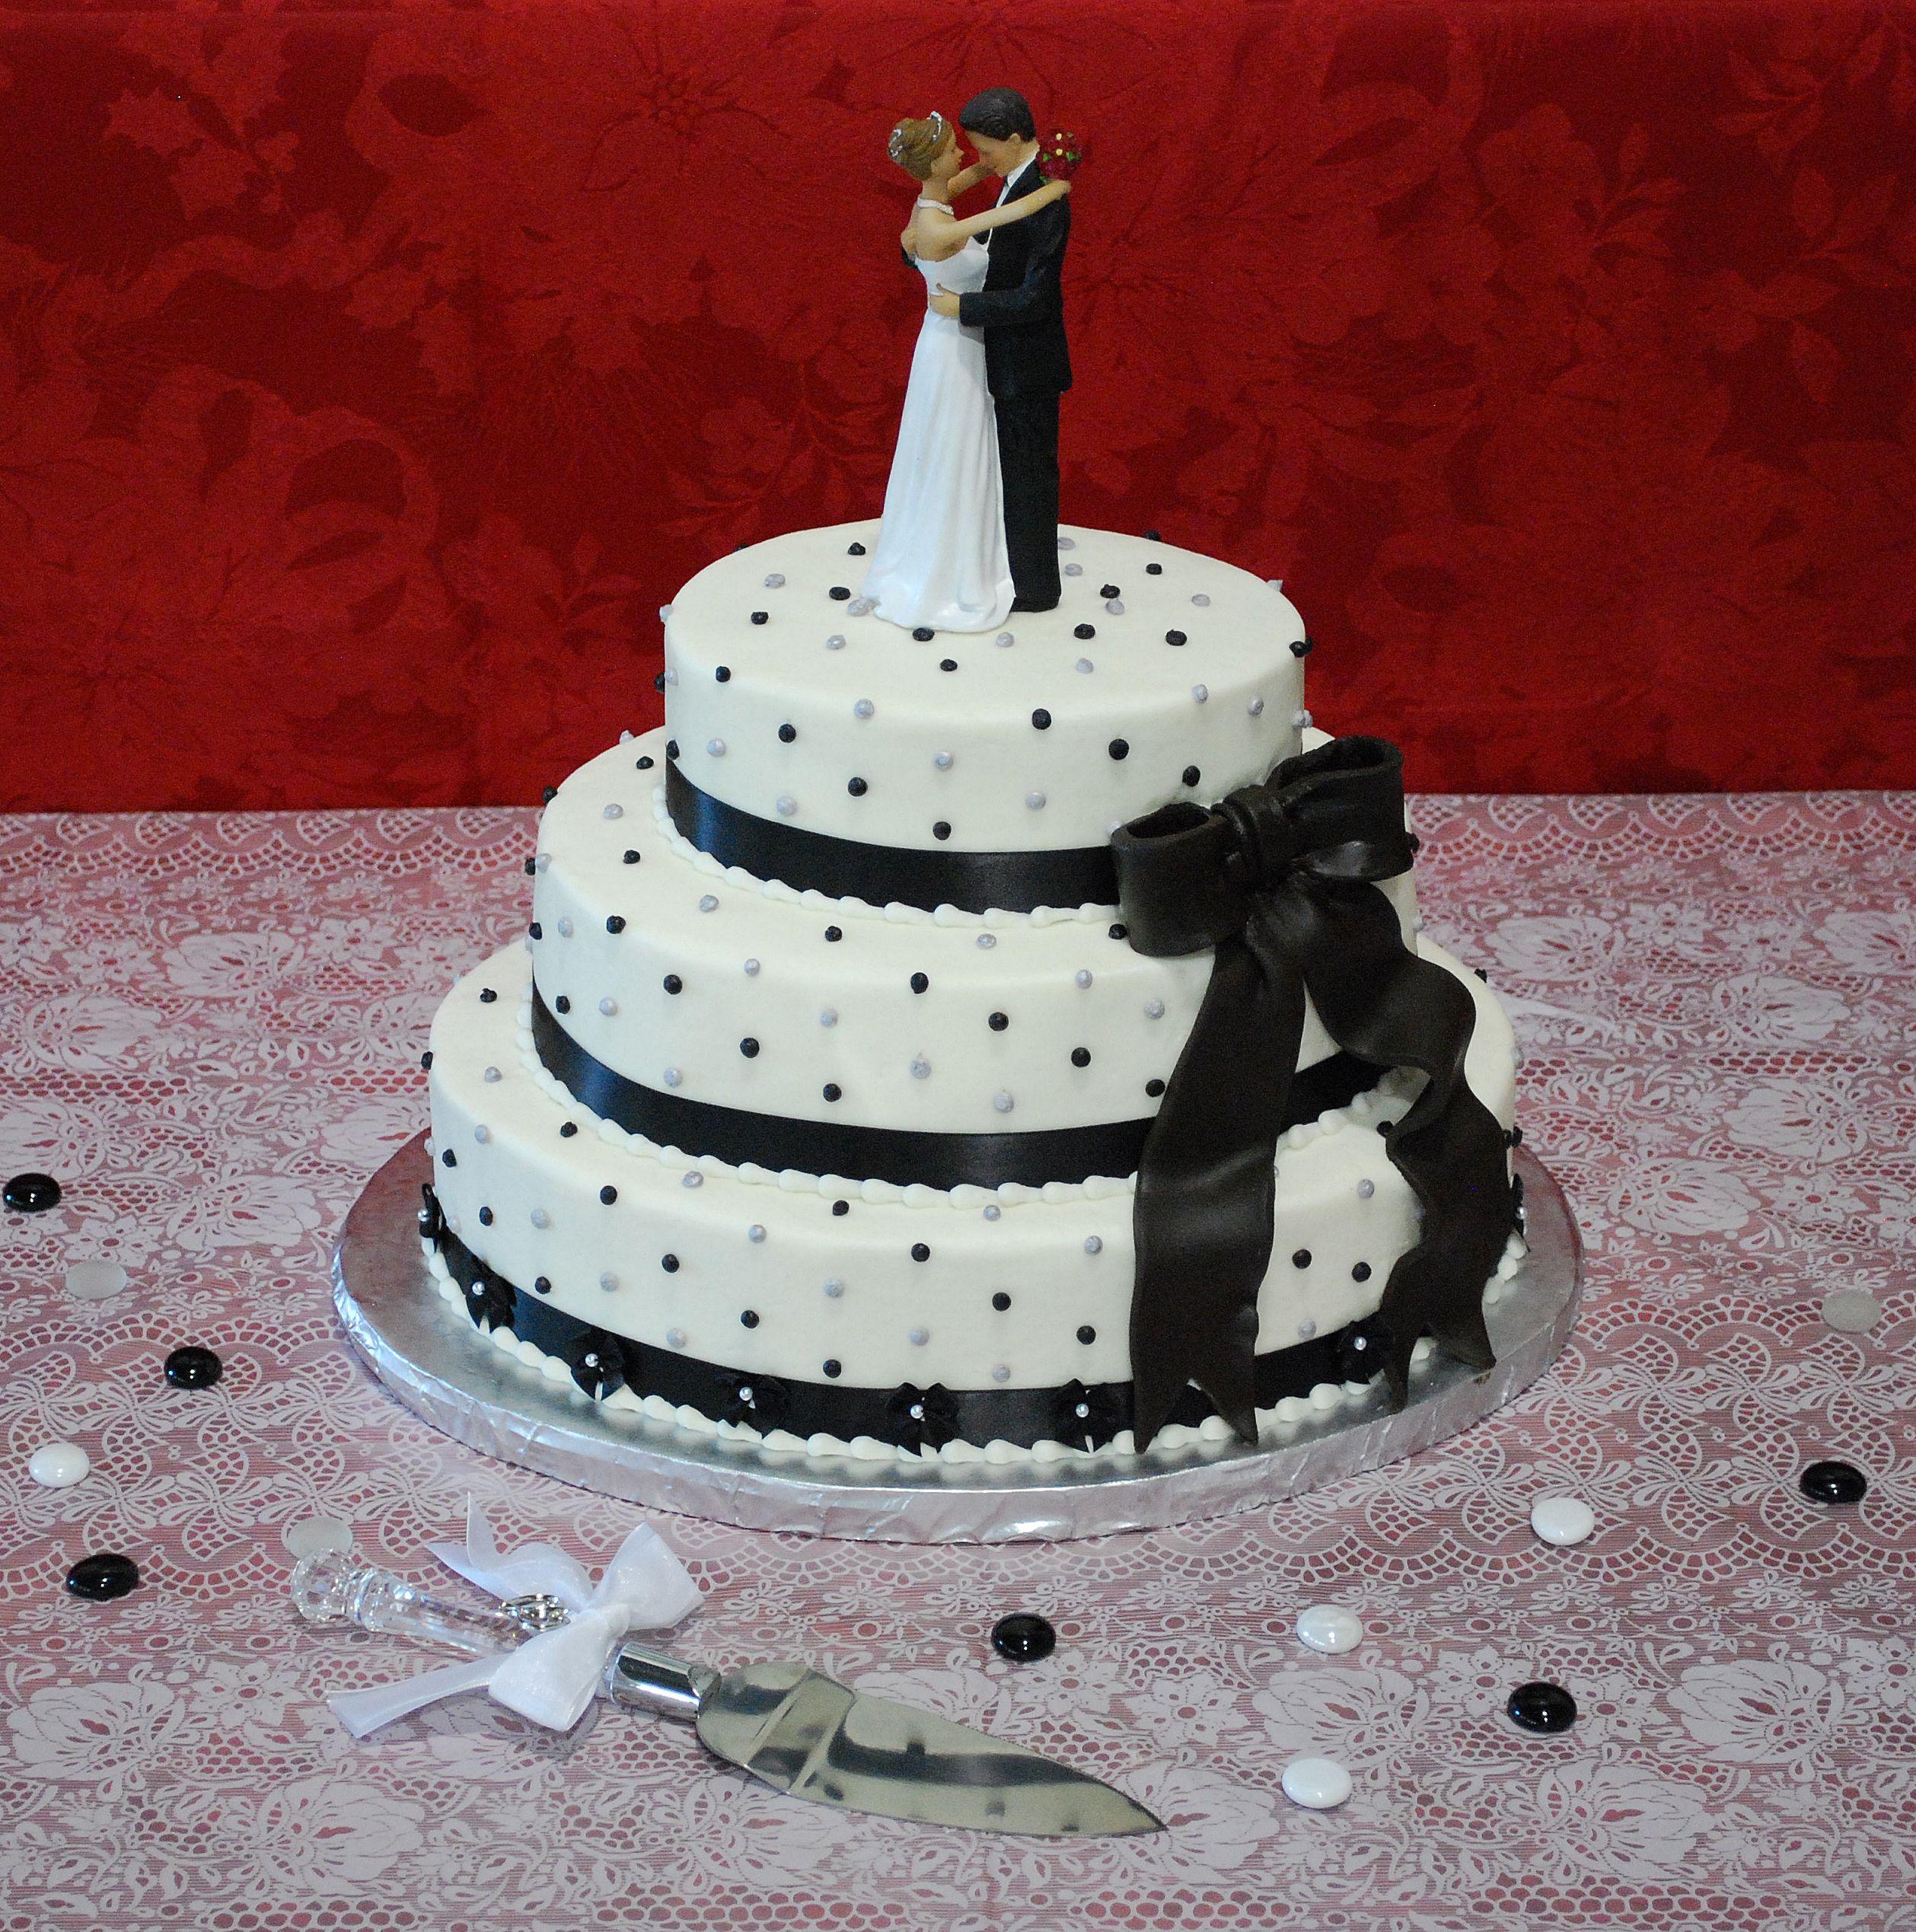 Oval Wedding Cake Black White Red Interesting Diagonal Design Of The